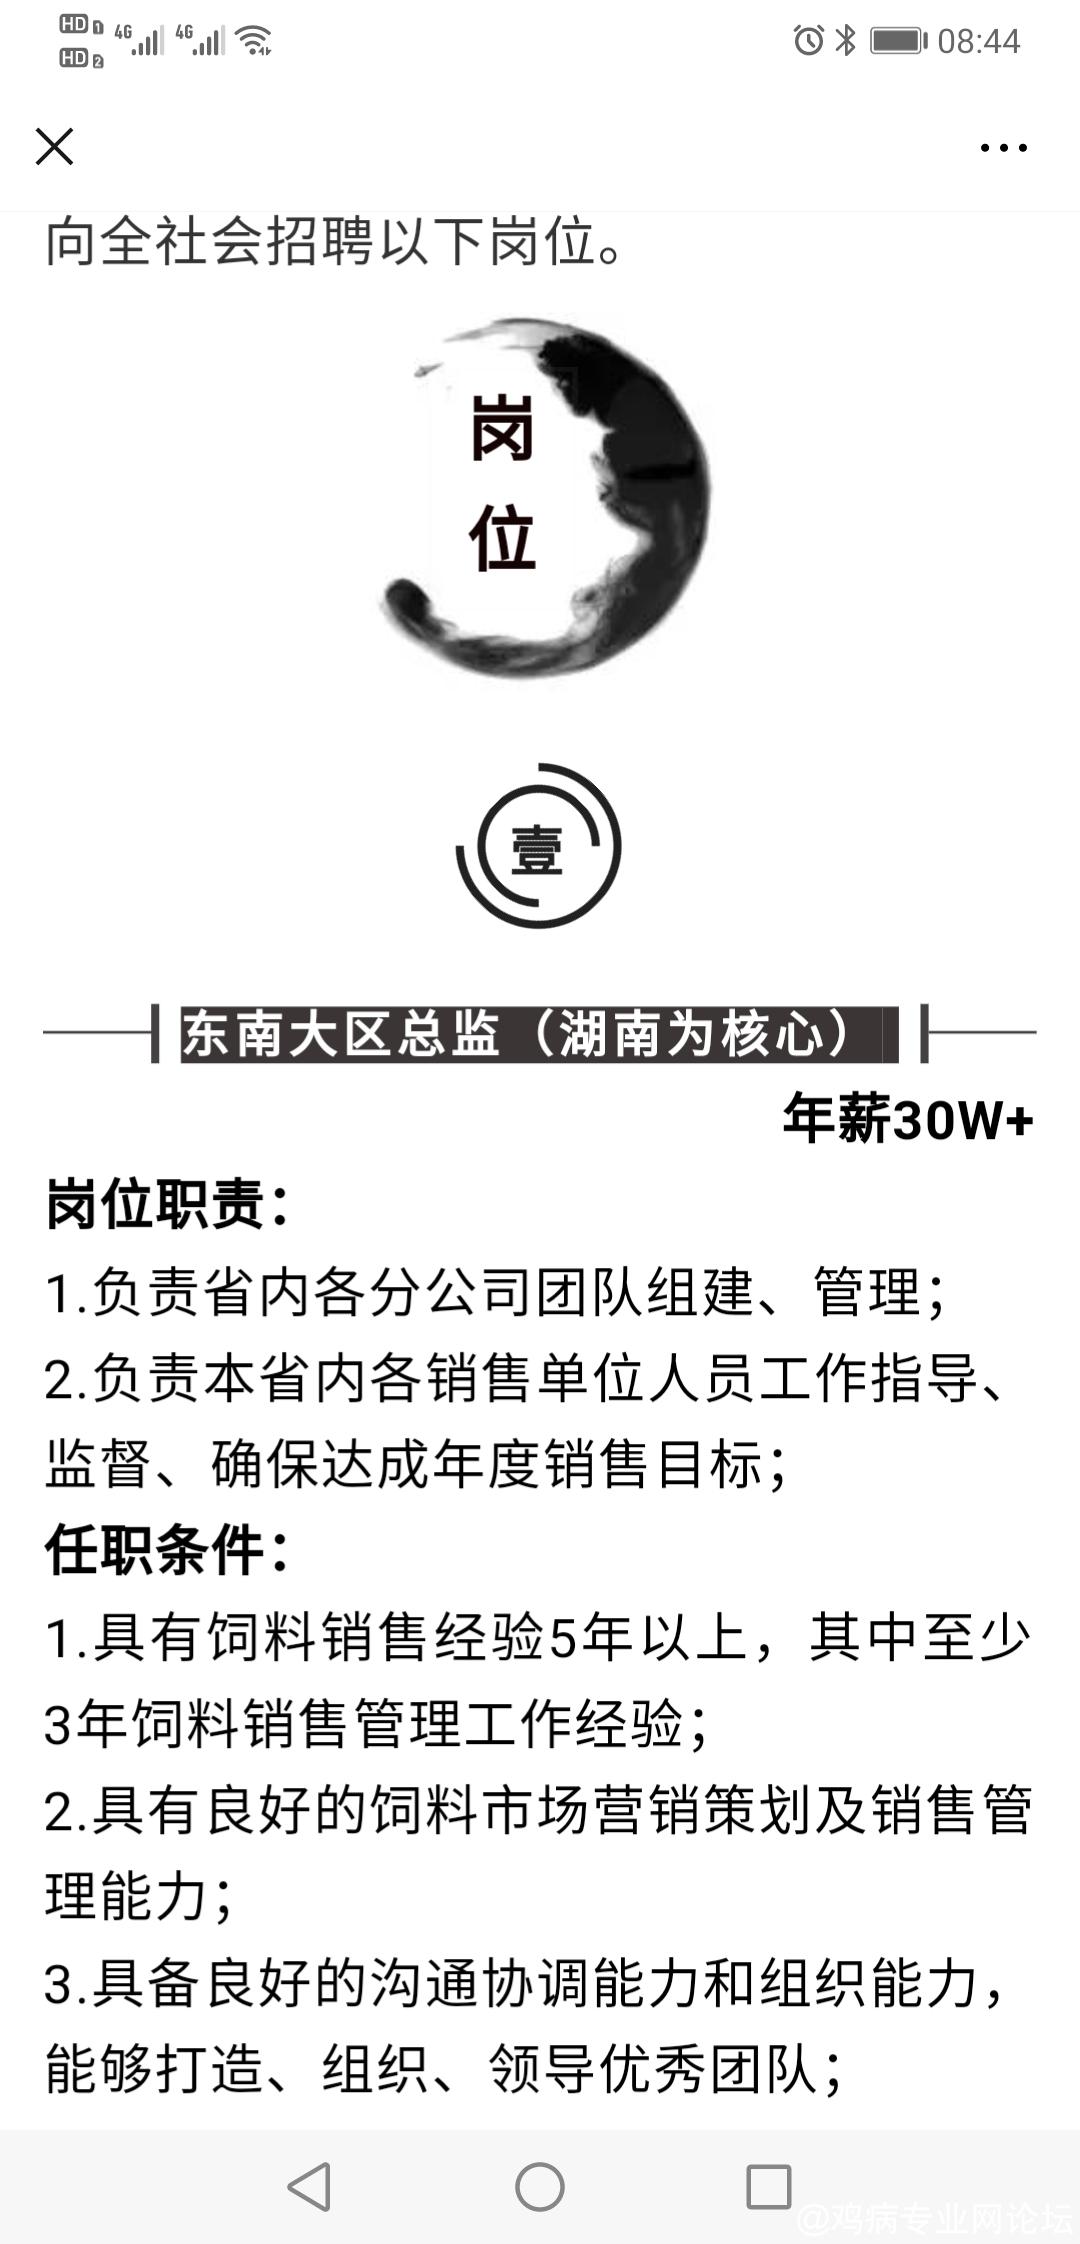 Screenshot_20200411_084440_com.tencent.mm.jpg